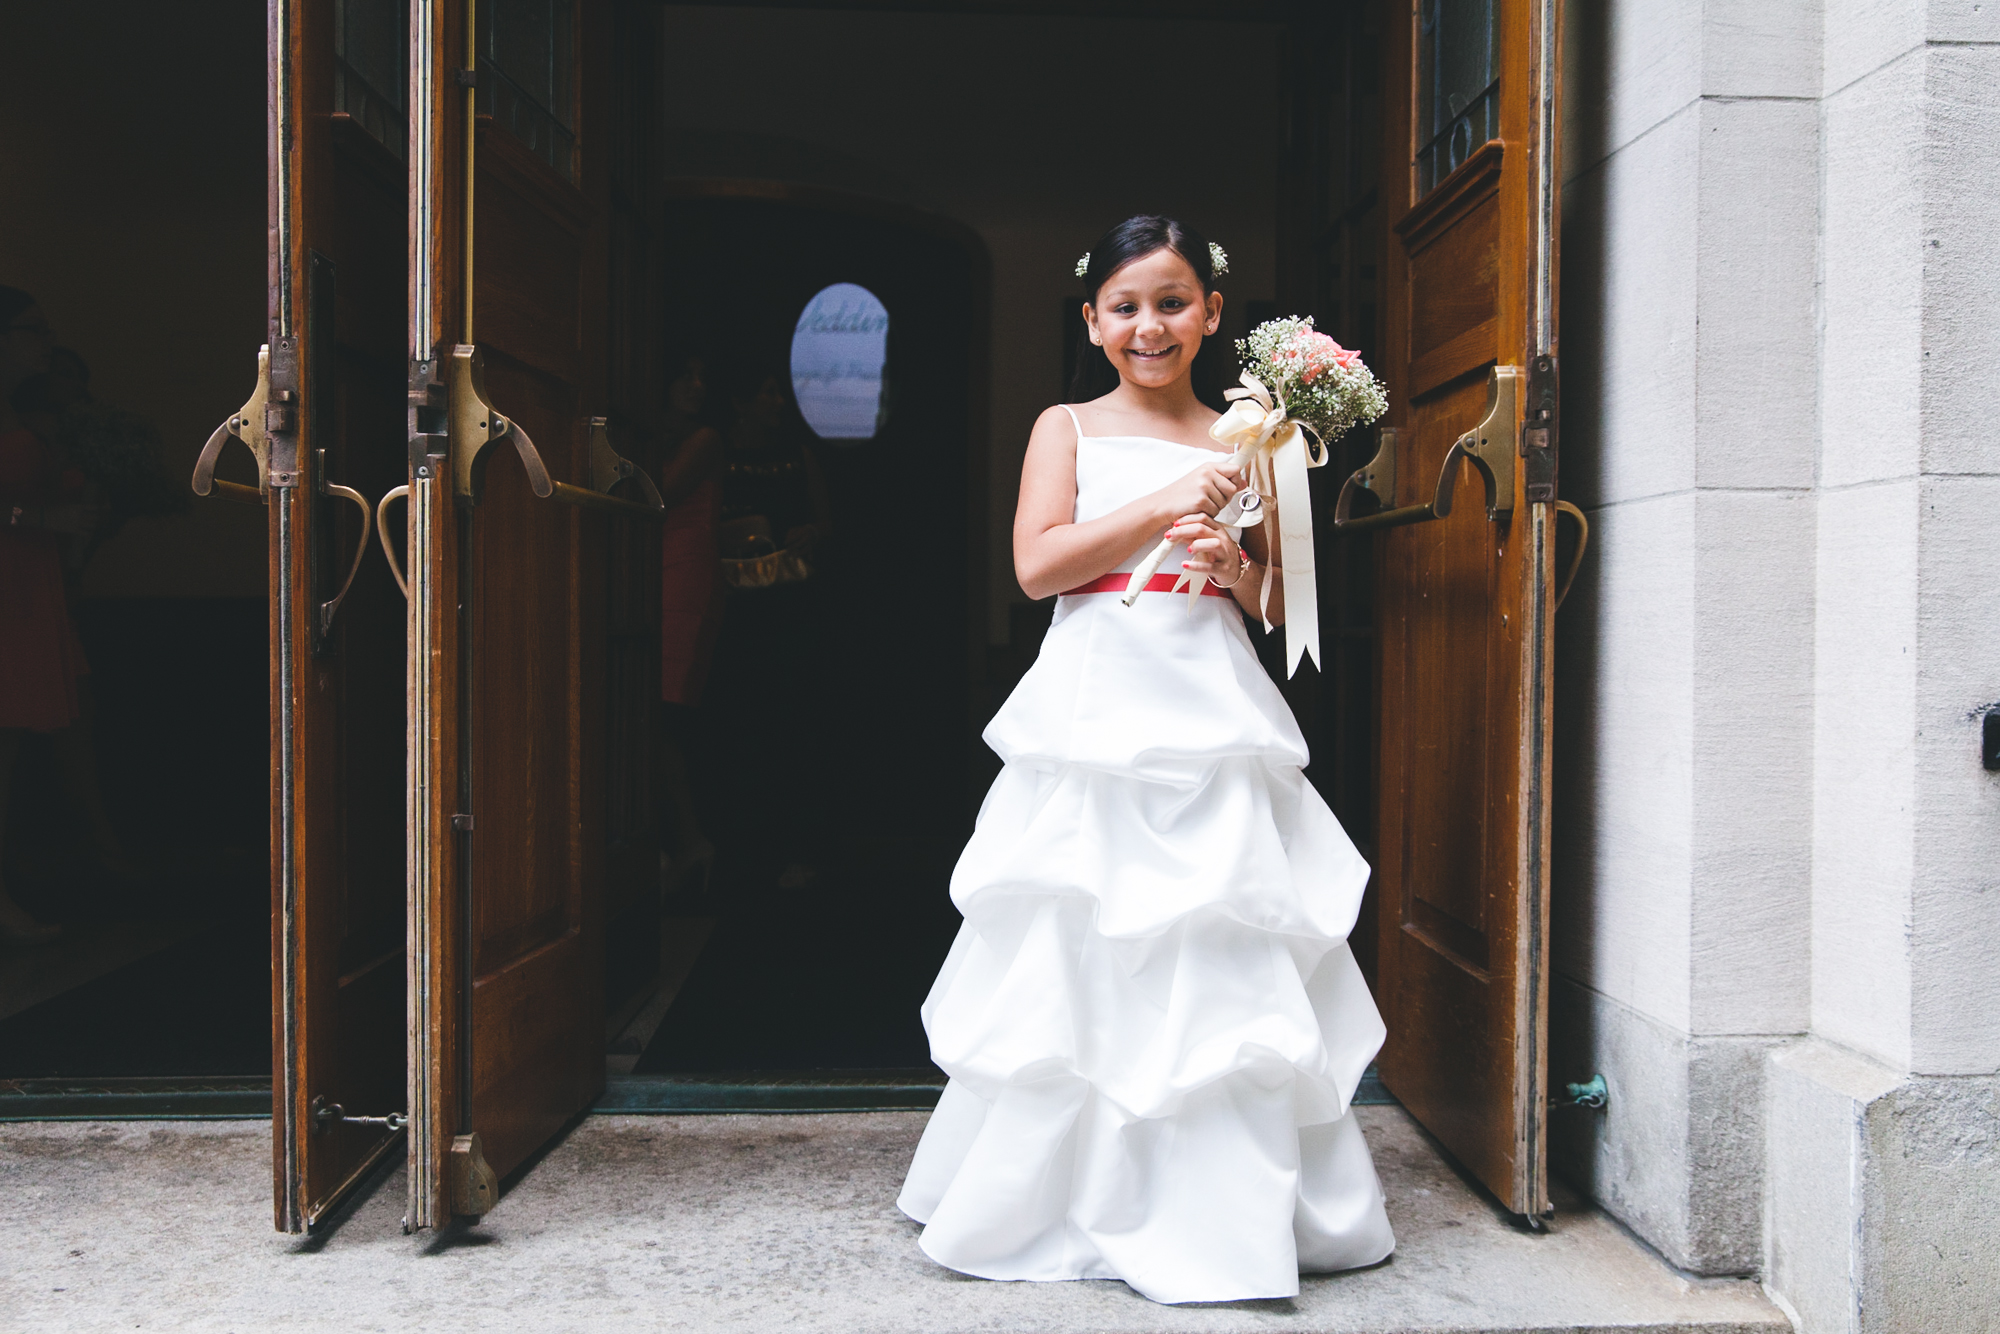 PriscillaJeffrey-Central-Park-Wedding-Elopement-Photography-NYC-11.jpg